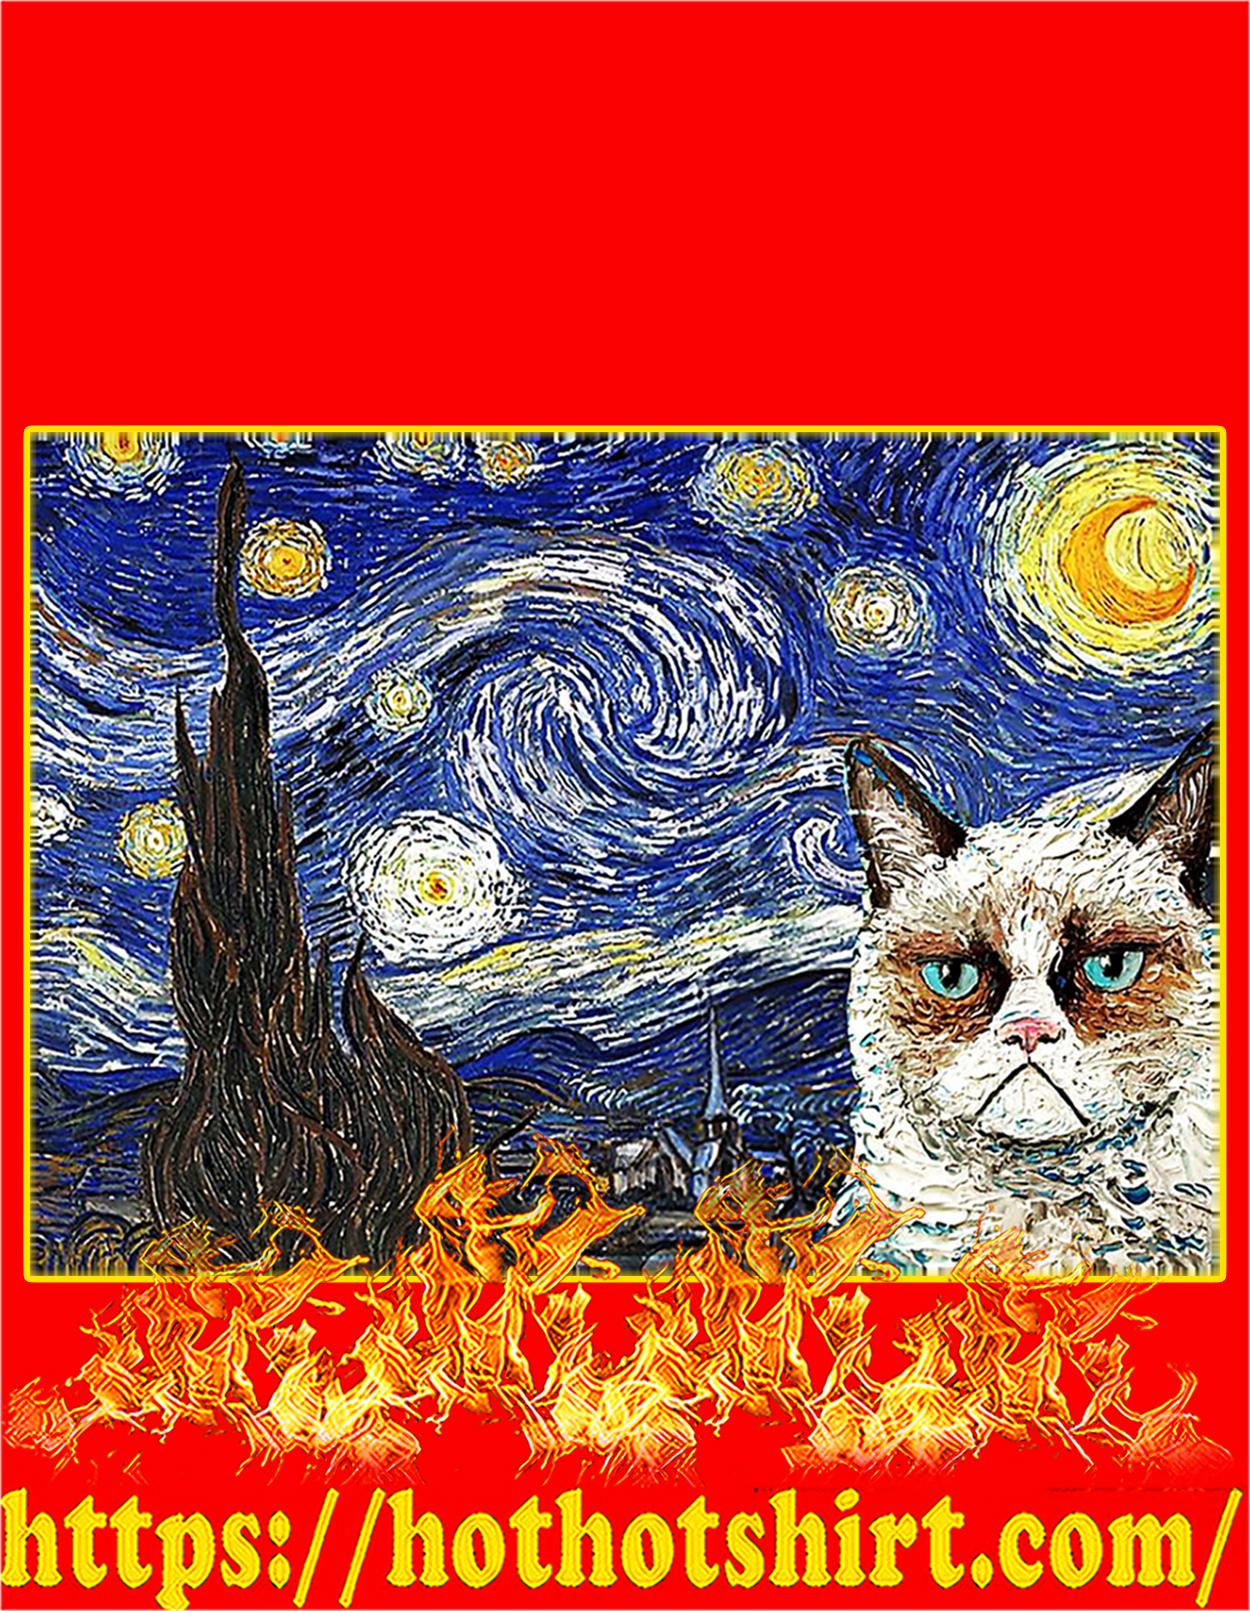 Grumpy cat starry night poster - A3